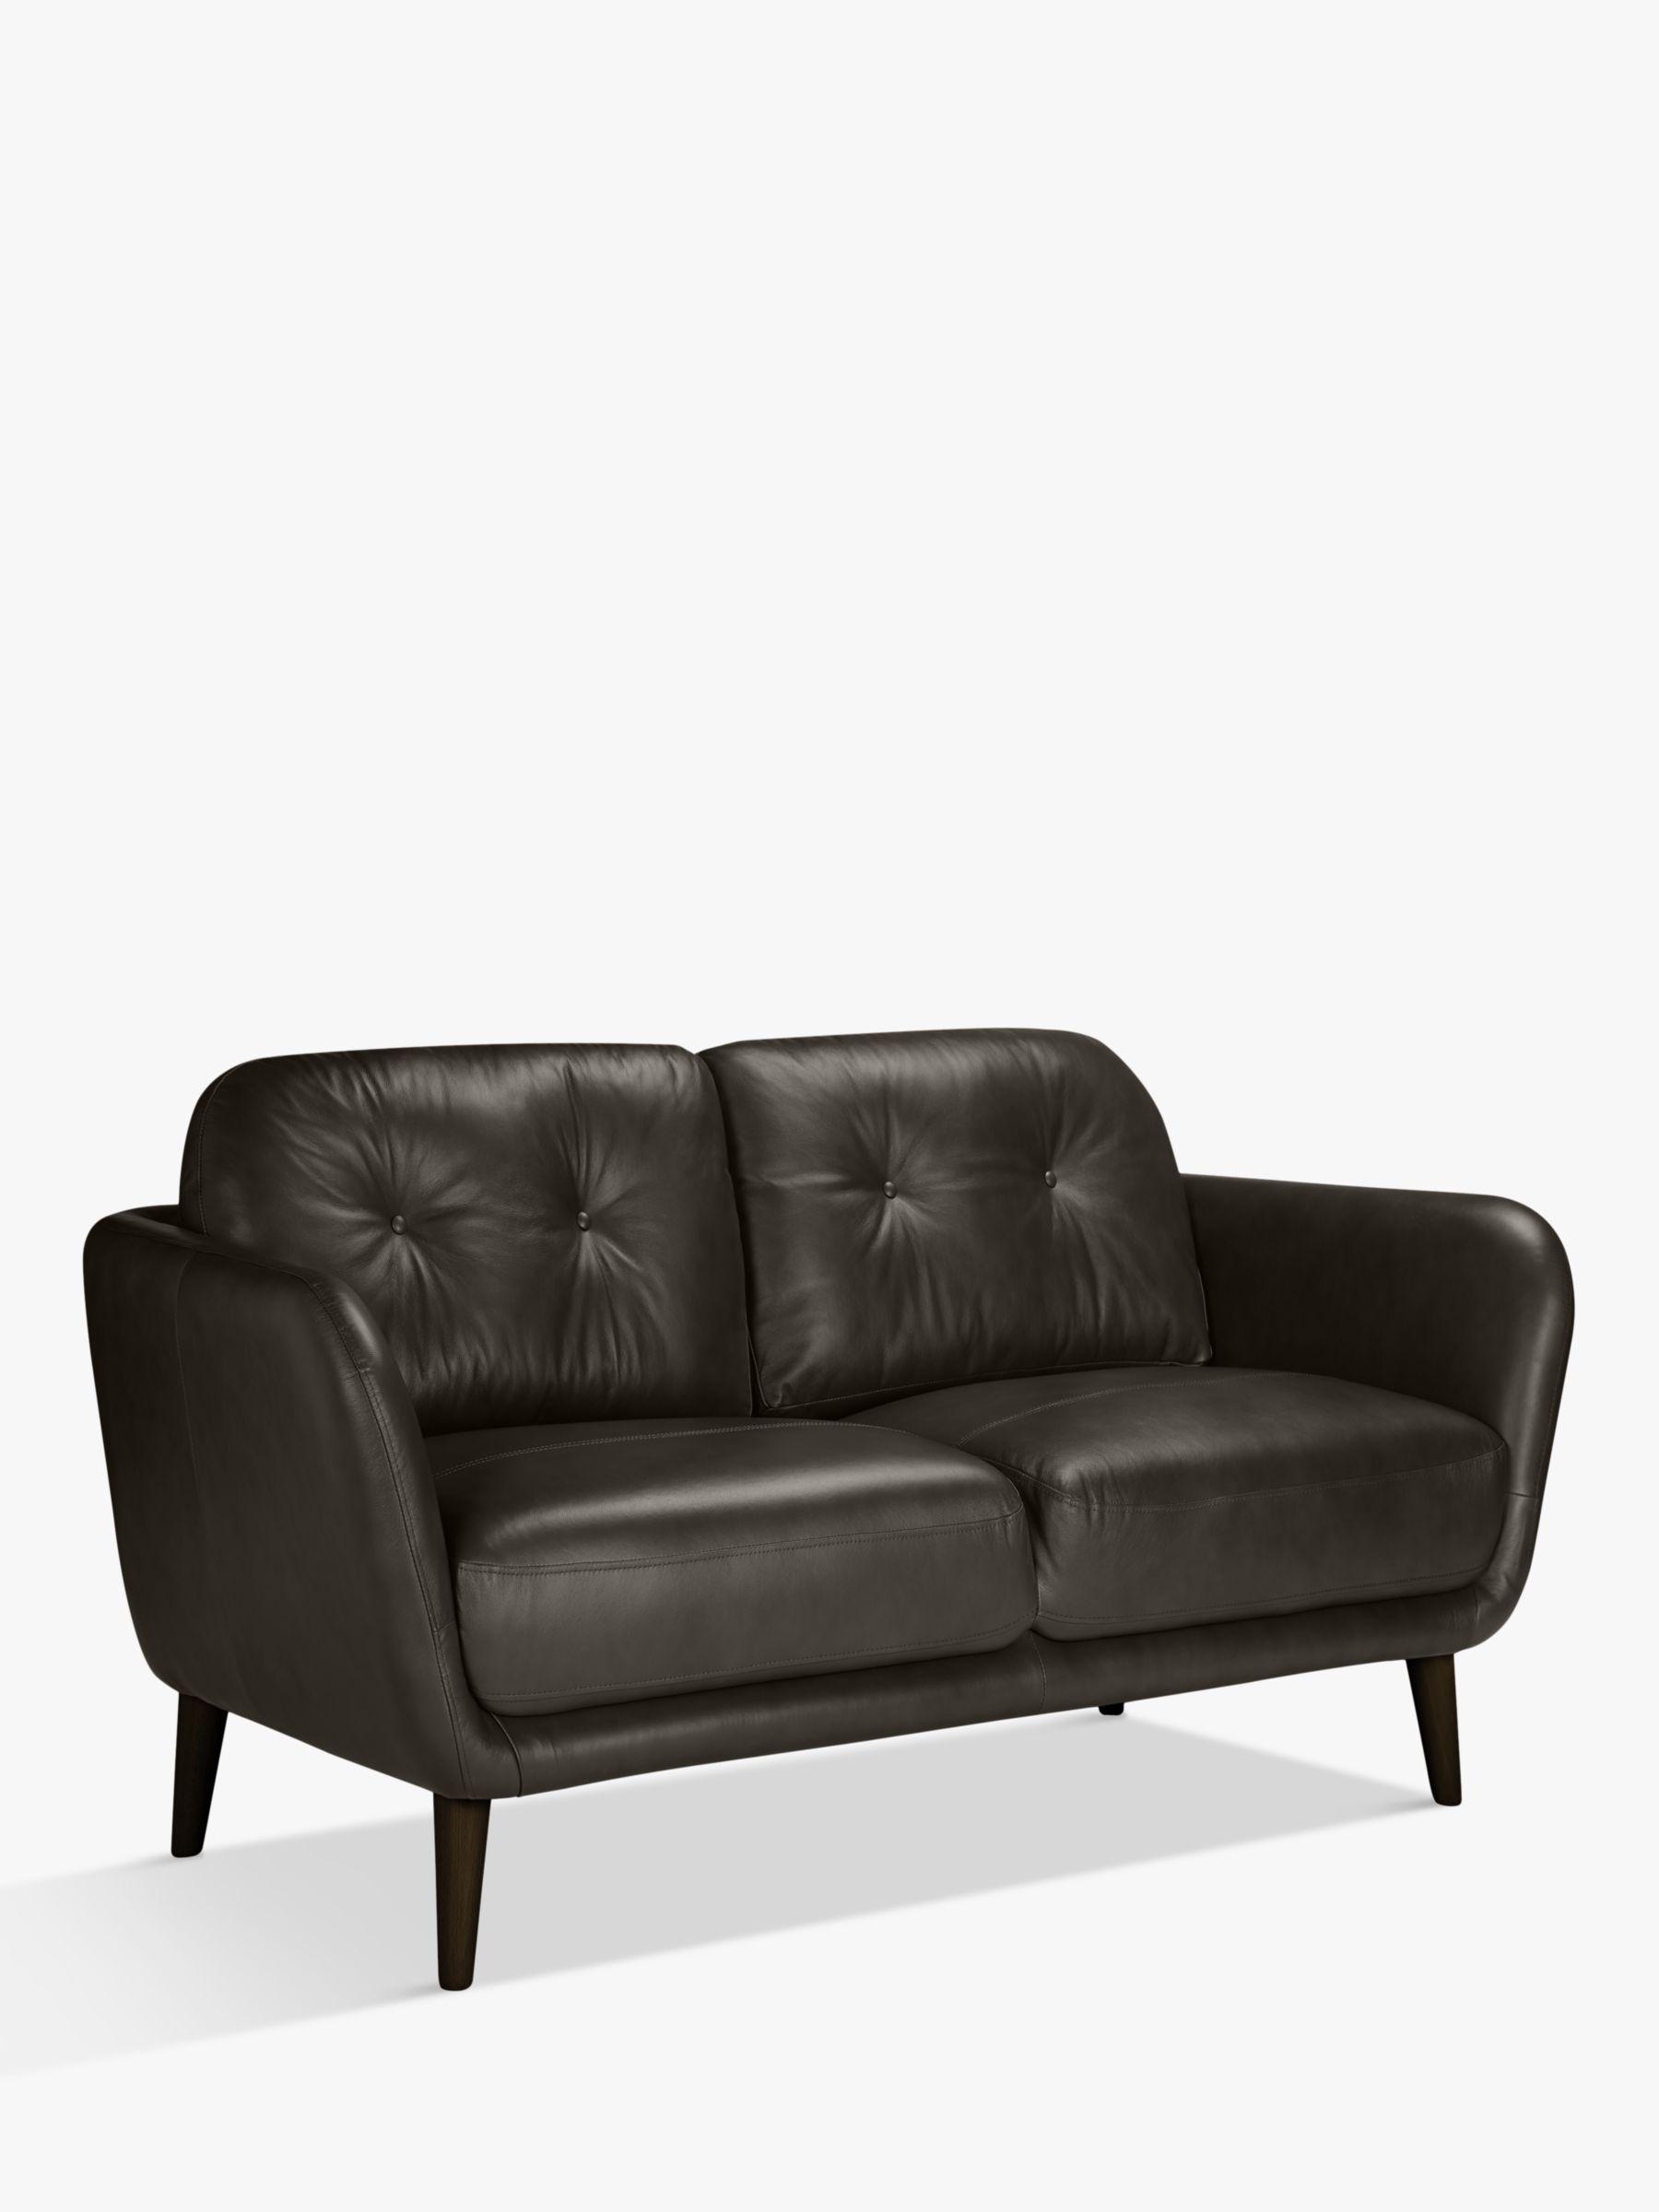 2 Seater Leather Sofa Milan Taupe